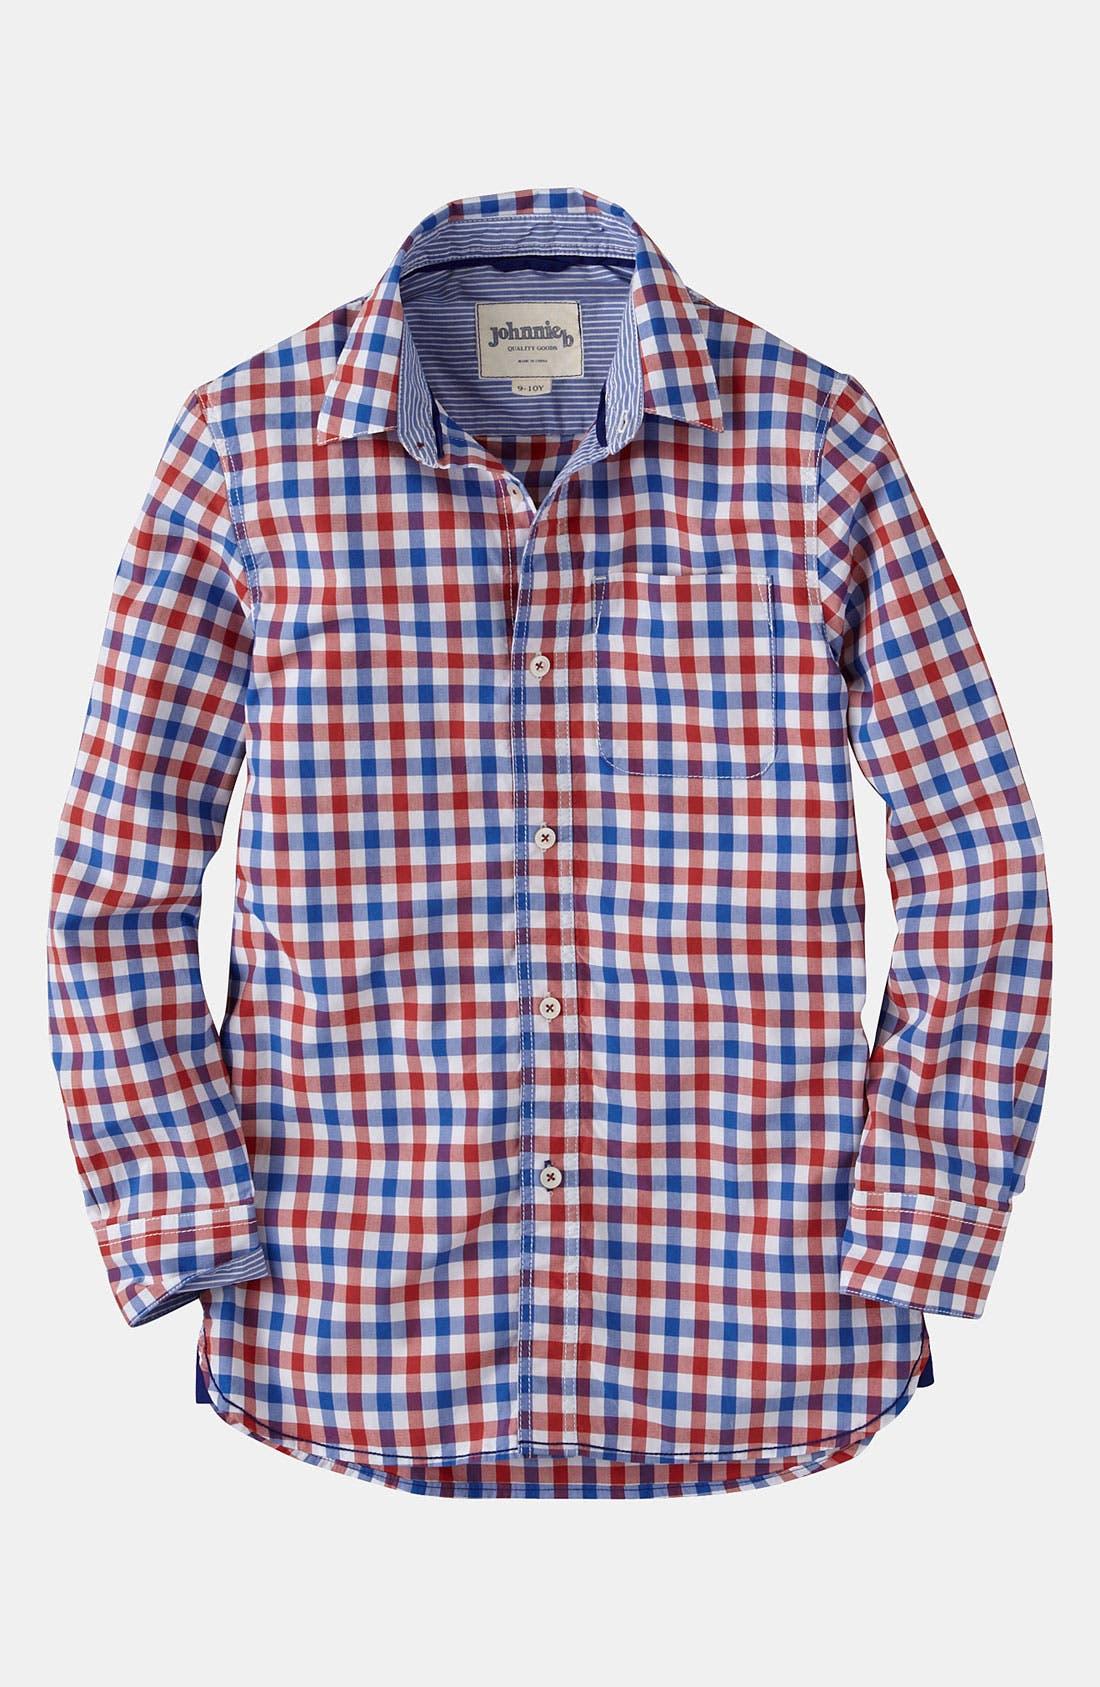 Main Image - Johnnie b Woven Shirt (Big Boys)